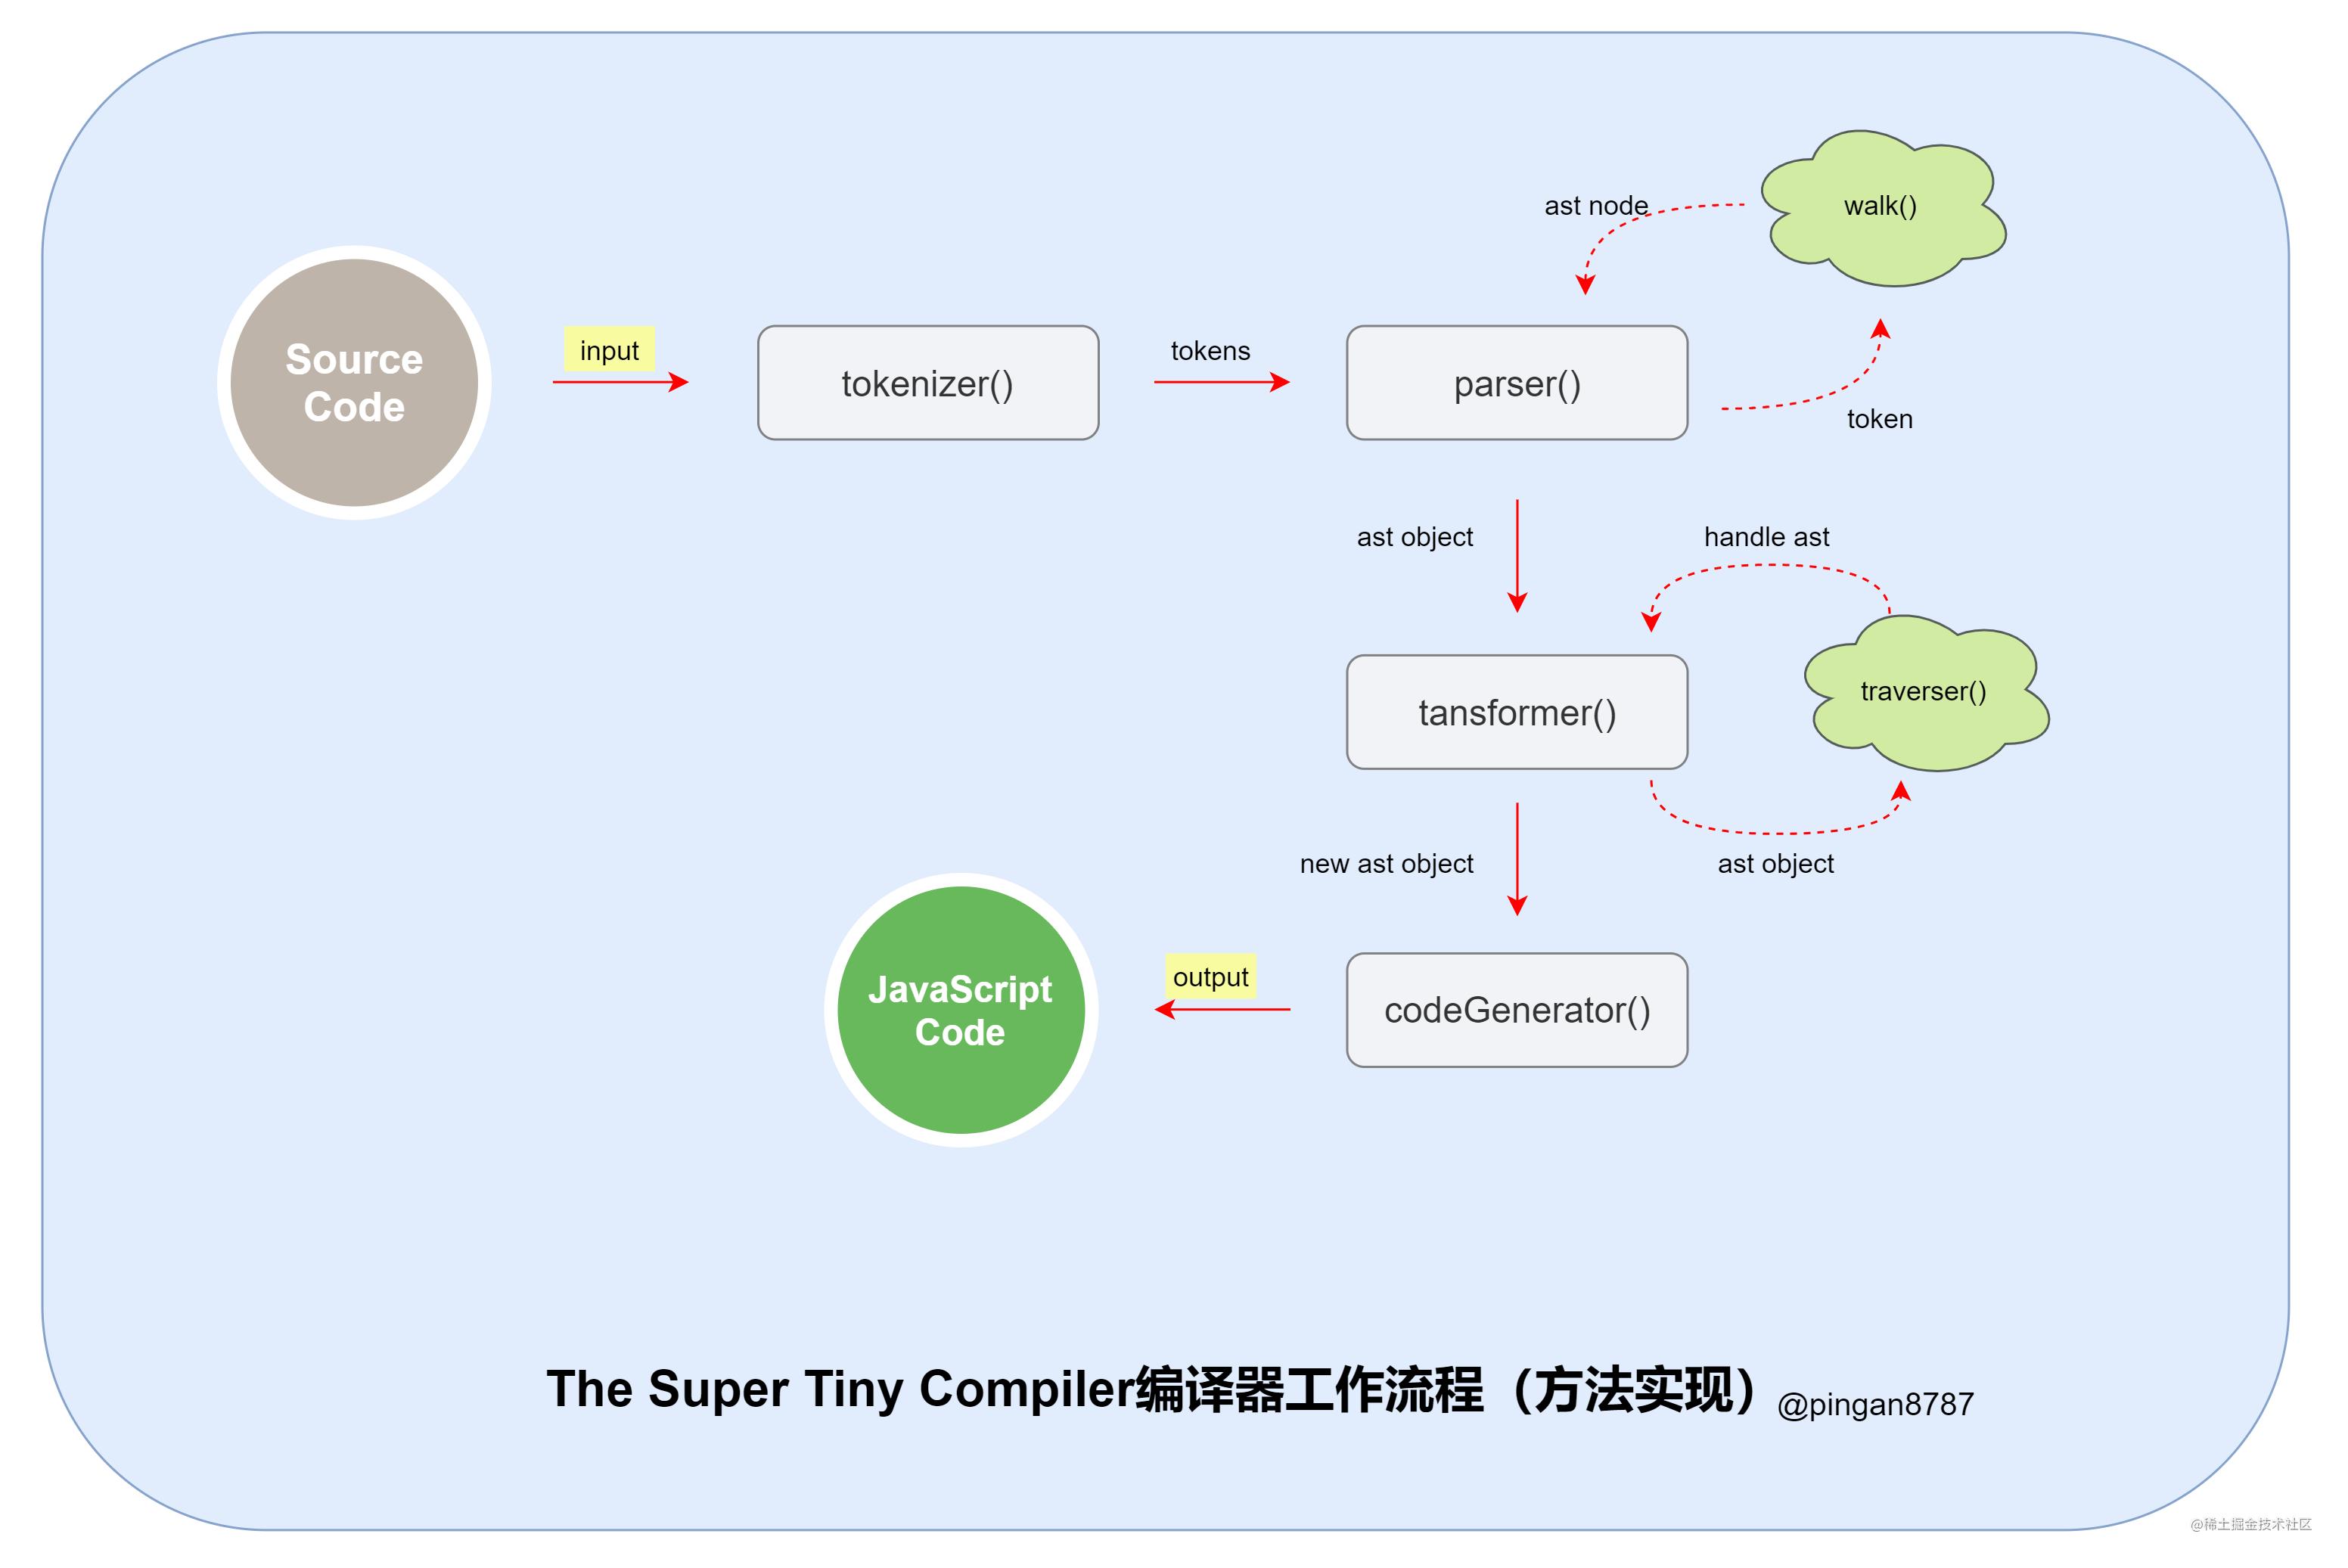 The Super Tiny Compiler编译器工作流程(方法实现).png